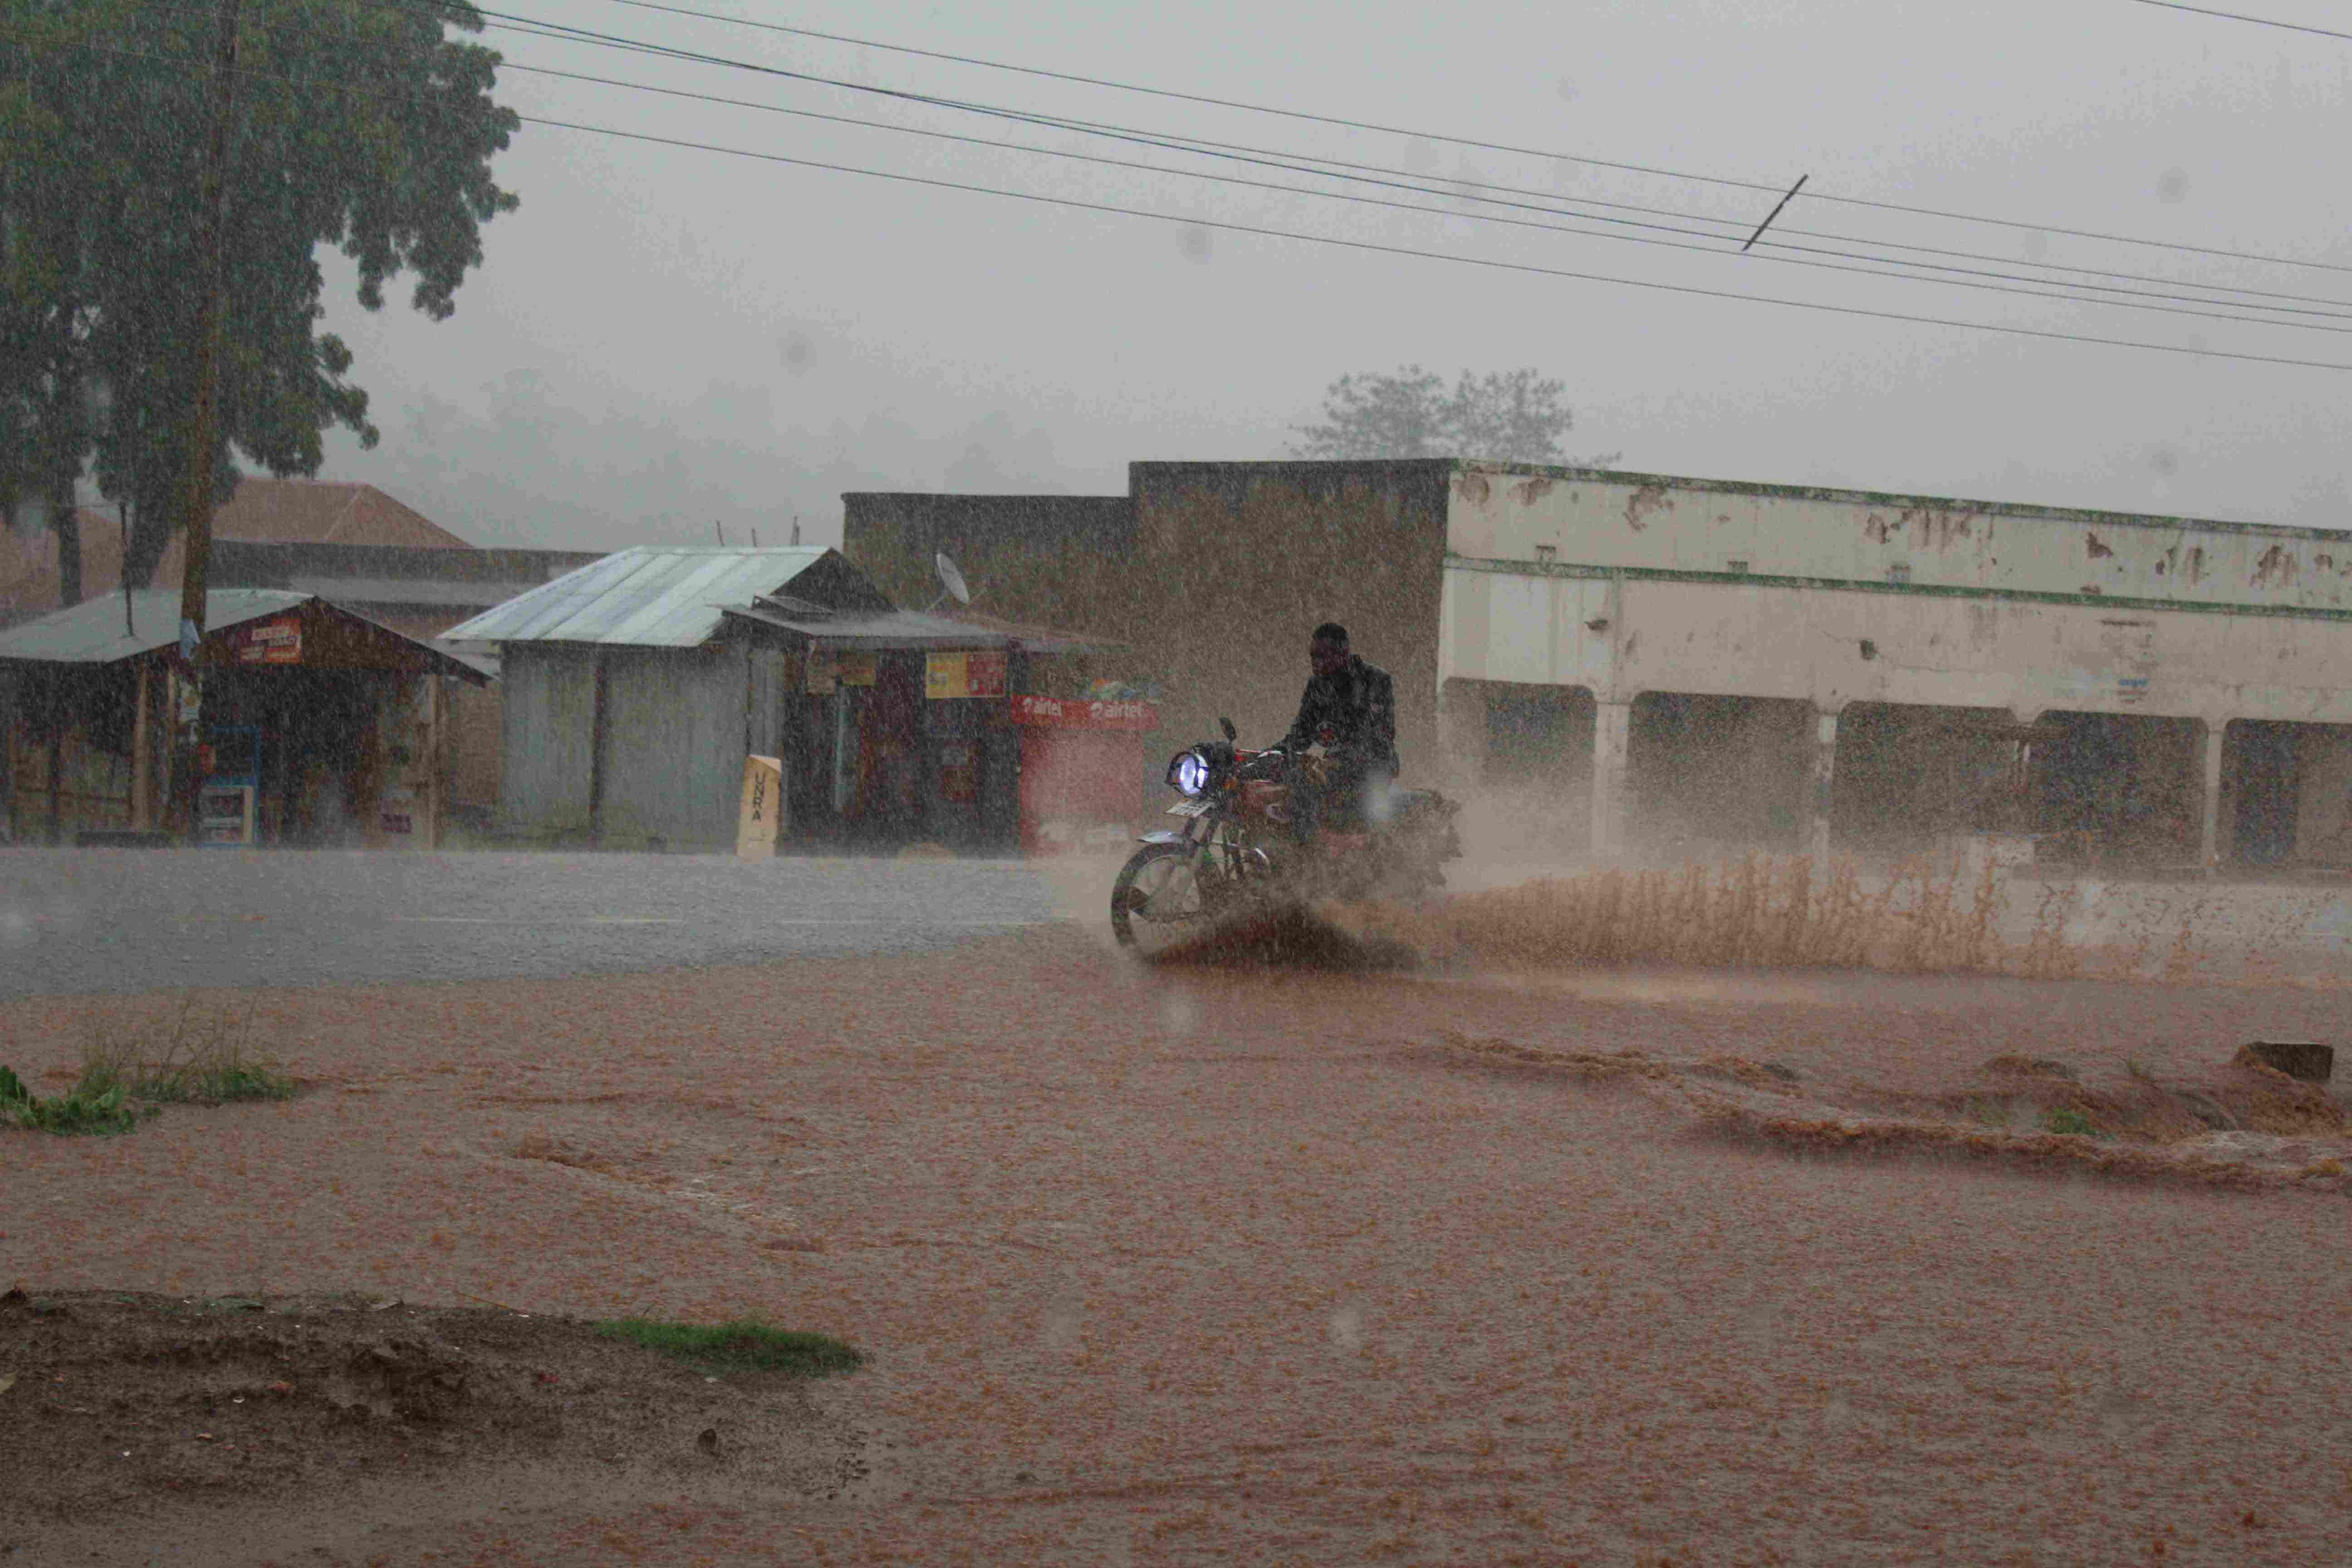 Boda Motor Cyclists Dared the Rain